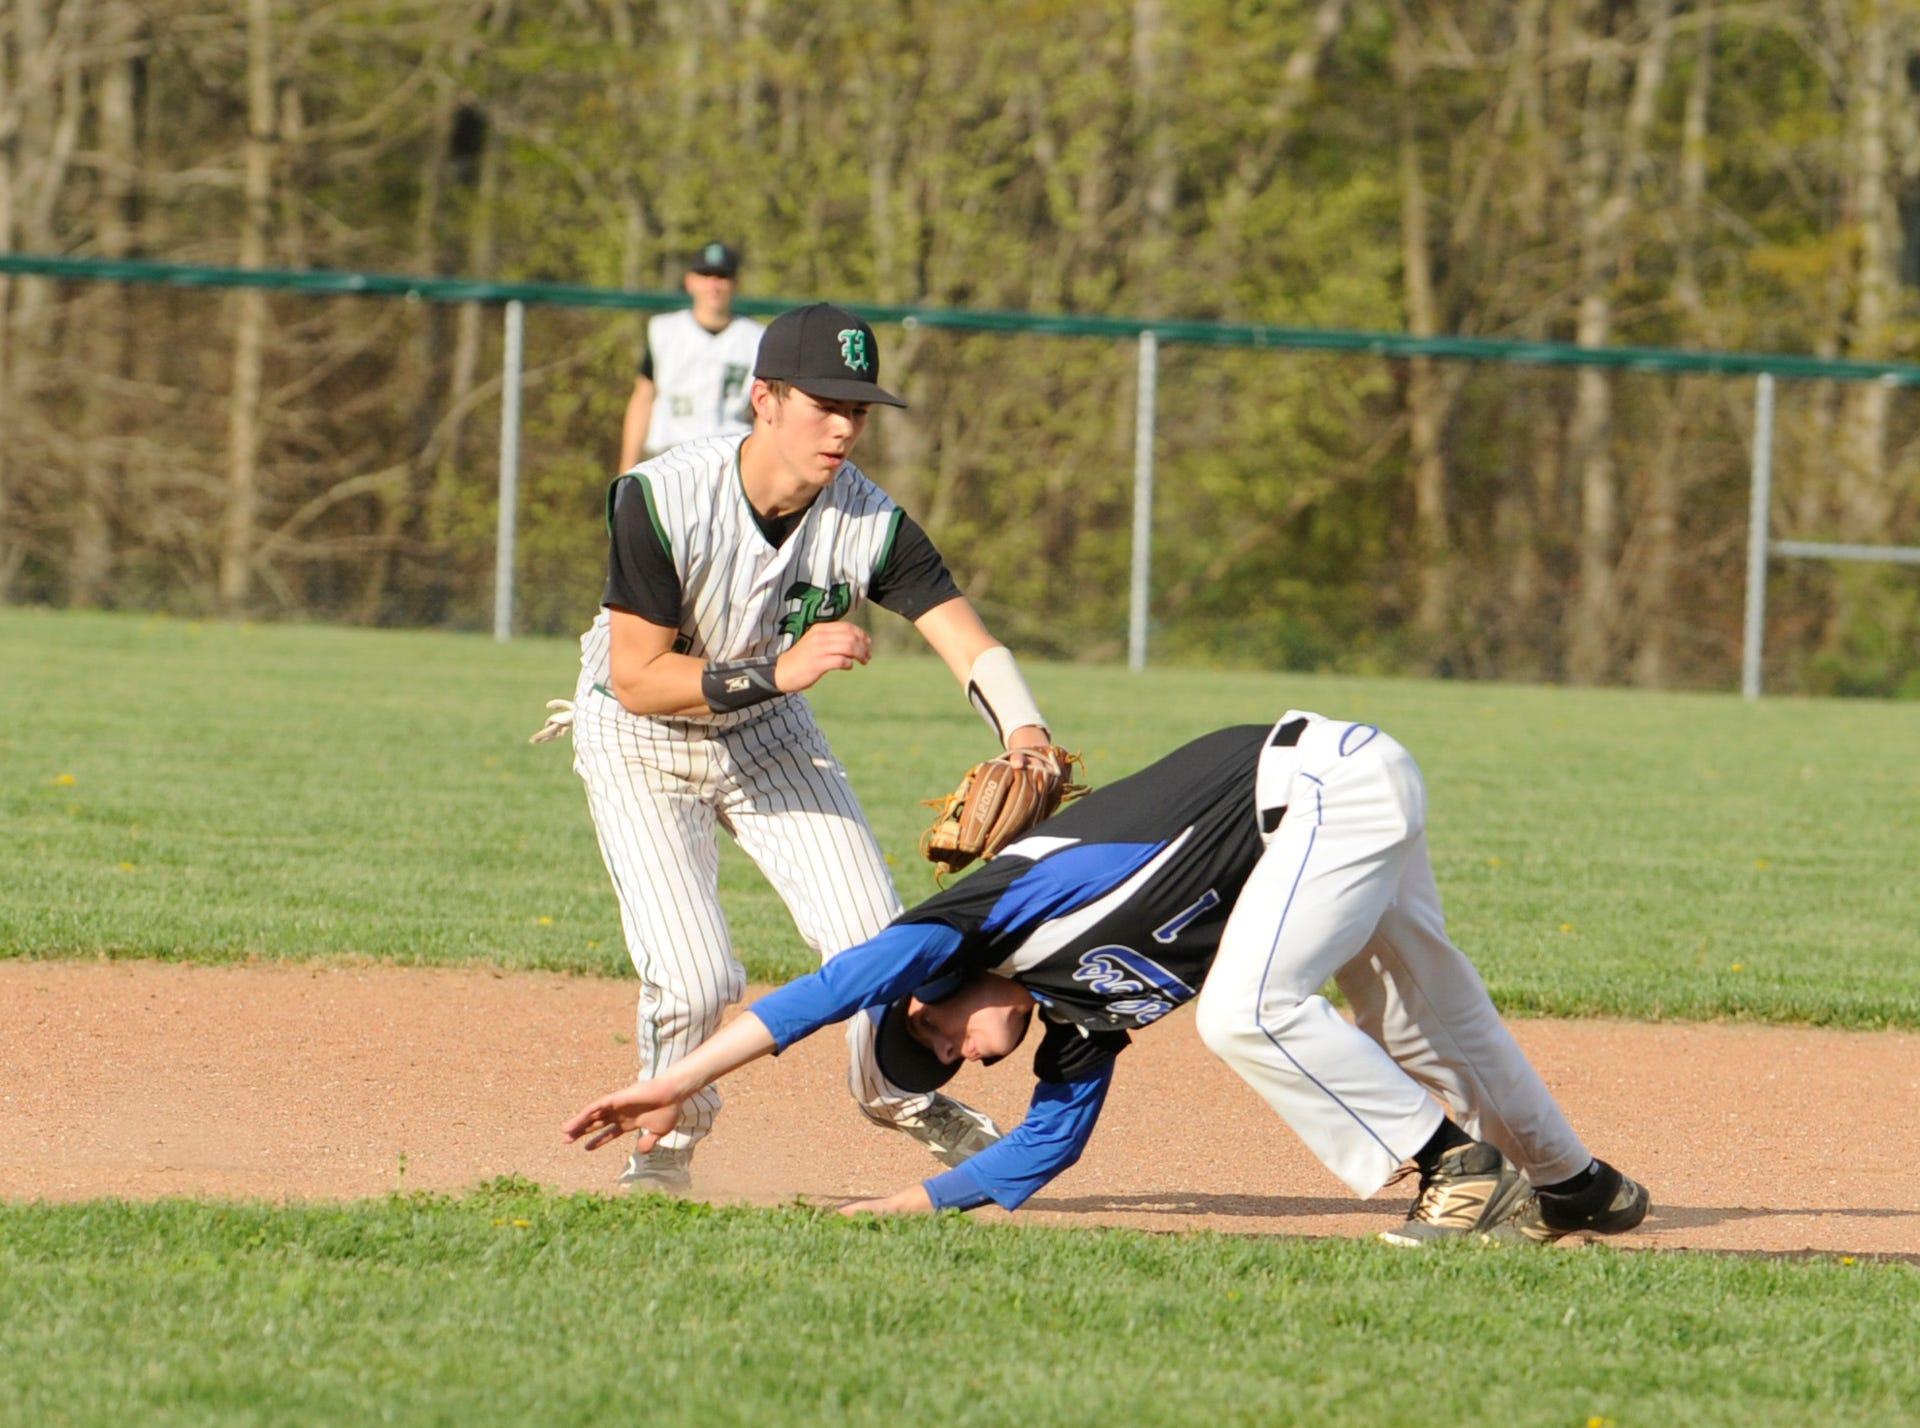 Huntington defeated Chillicothe 2-0 Thursday night at Huntington Township.